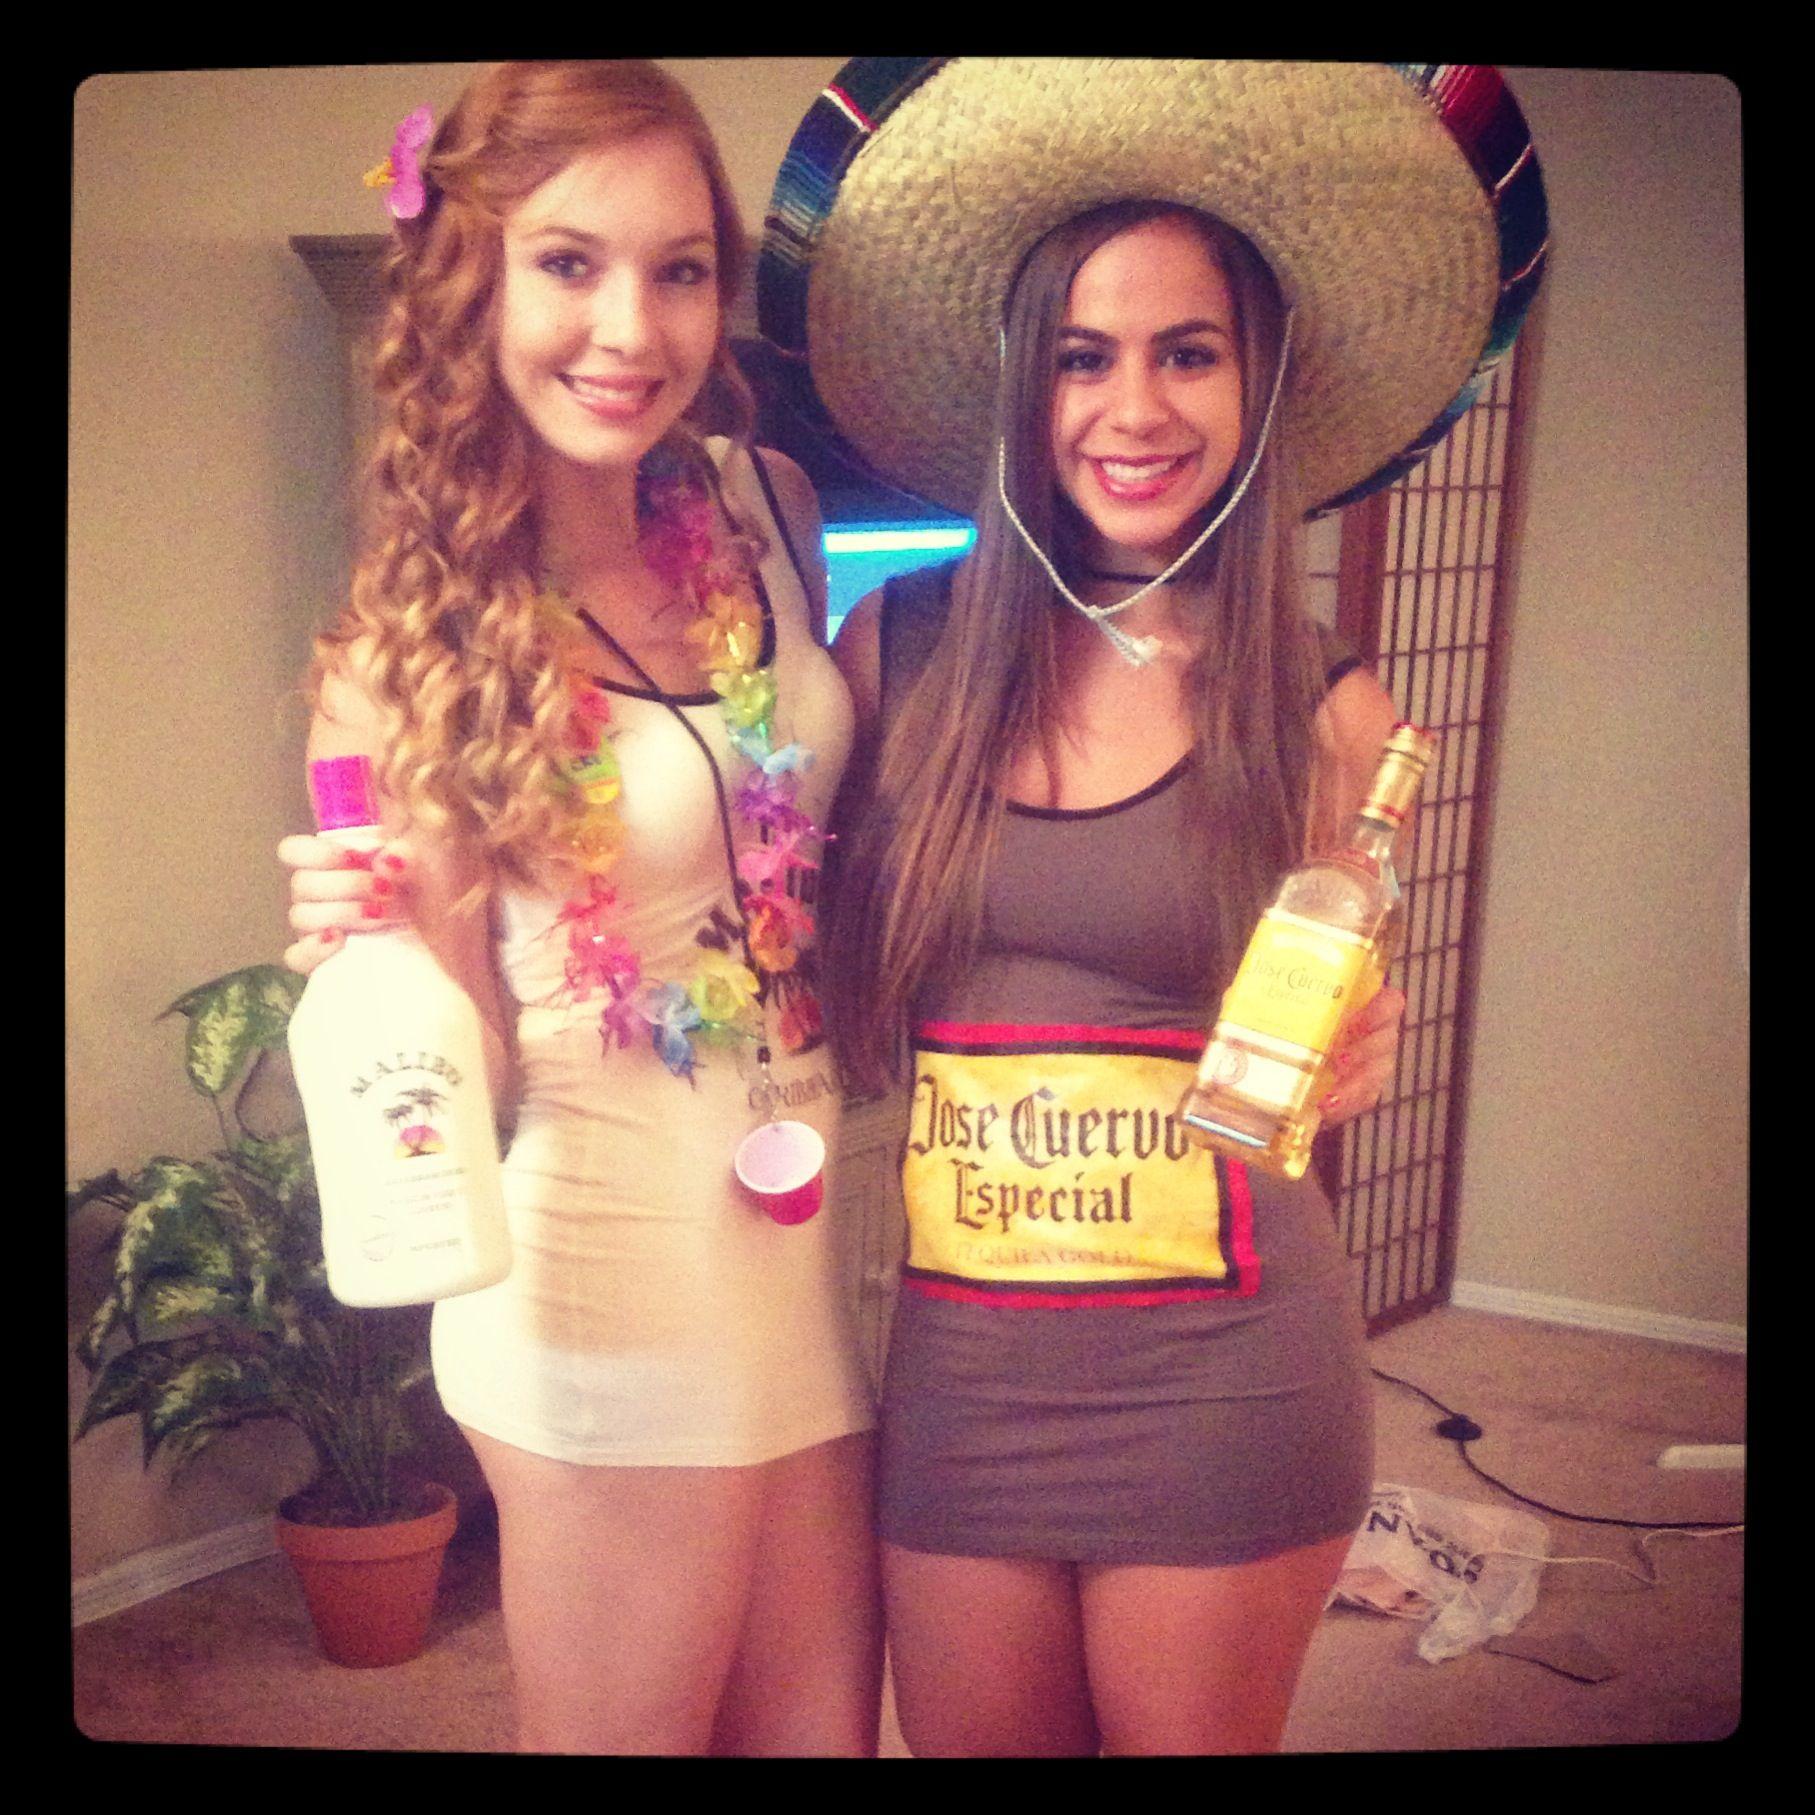 Malibu & Jose Cuervo DIY Halloween costumes | drinking | Pinterest ...